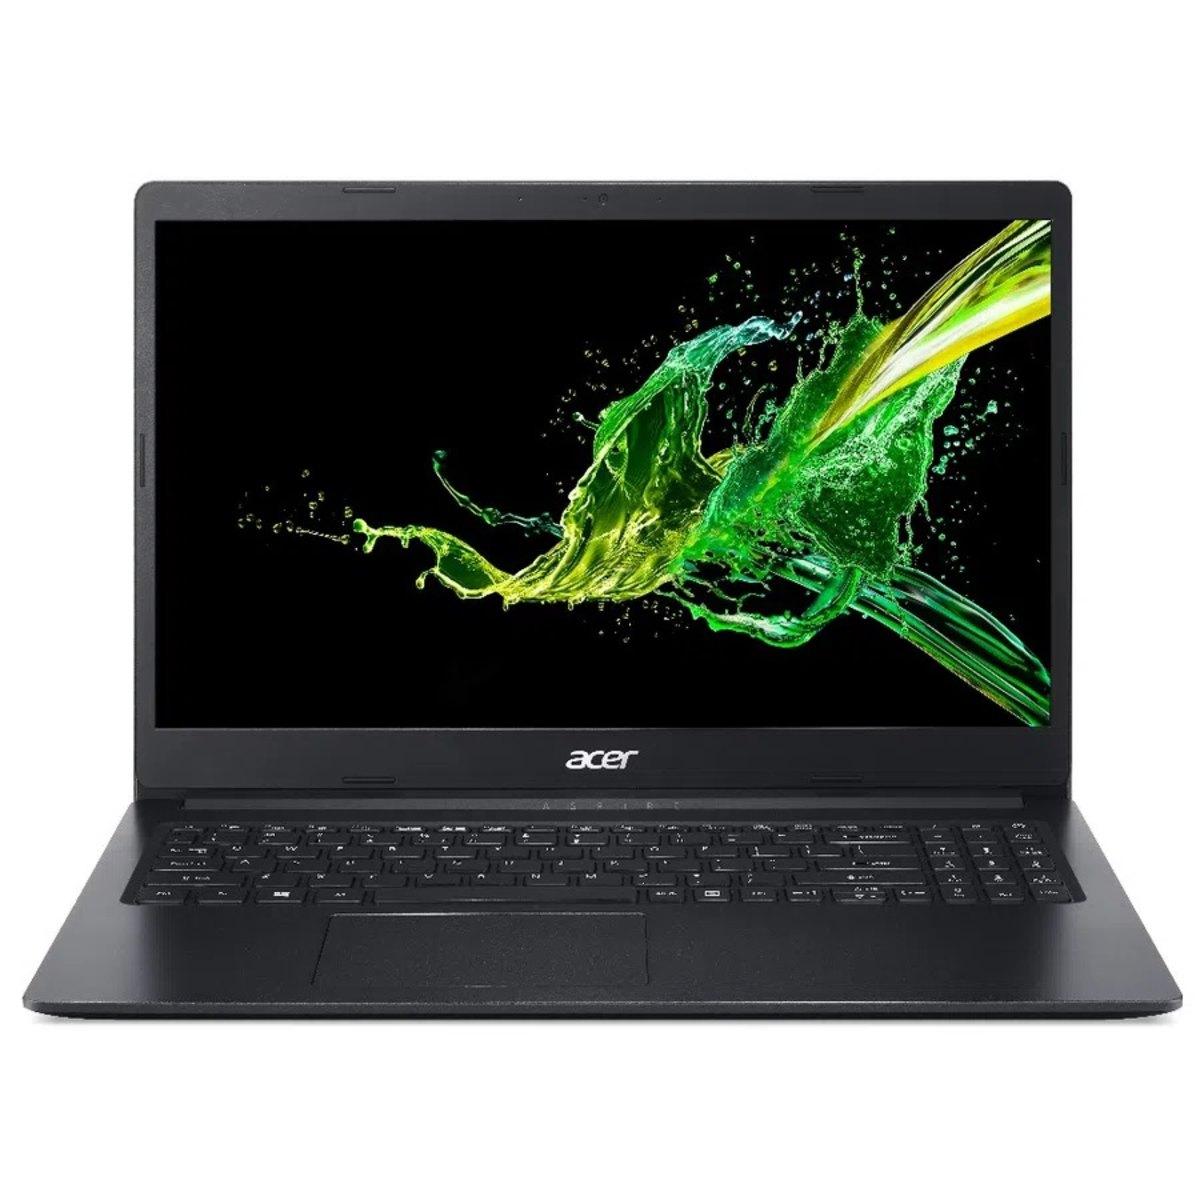 Notebook Acer A315 Intel Celeron N4000 Memoria 4gb Hd 1tb Tela 15.6' Hd Windows 10 Pro Outlet